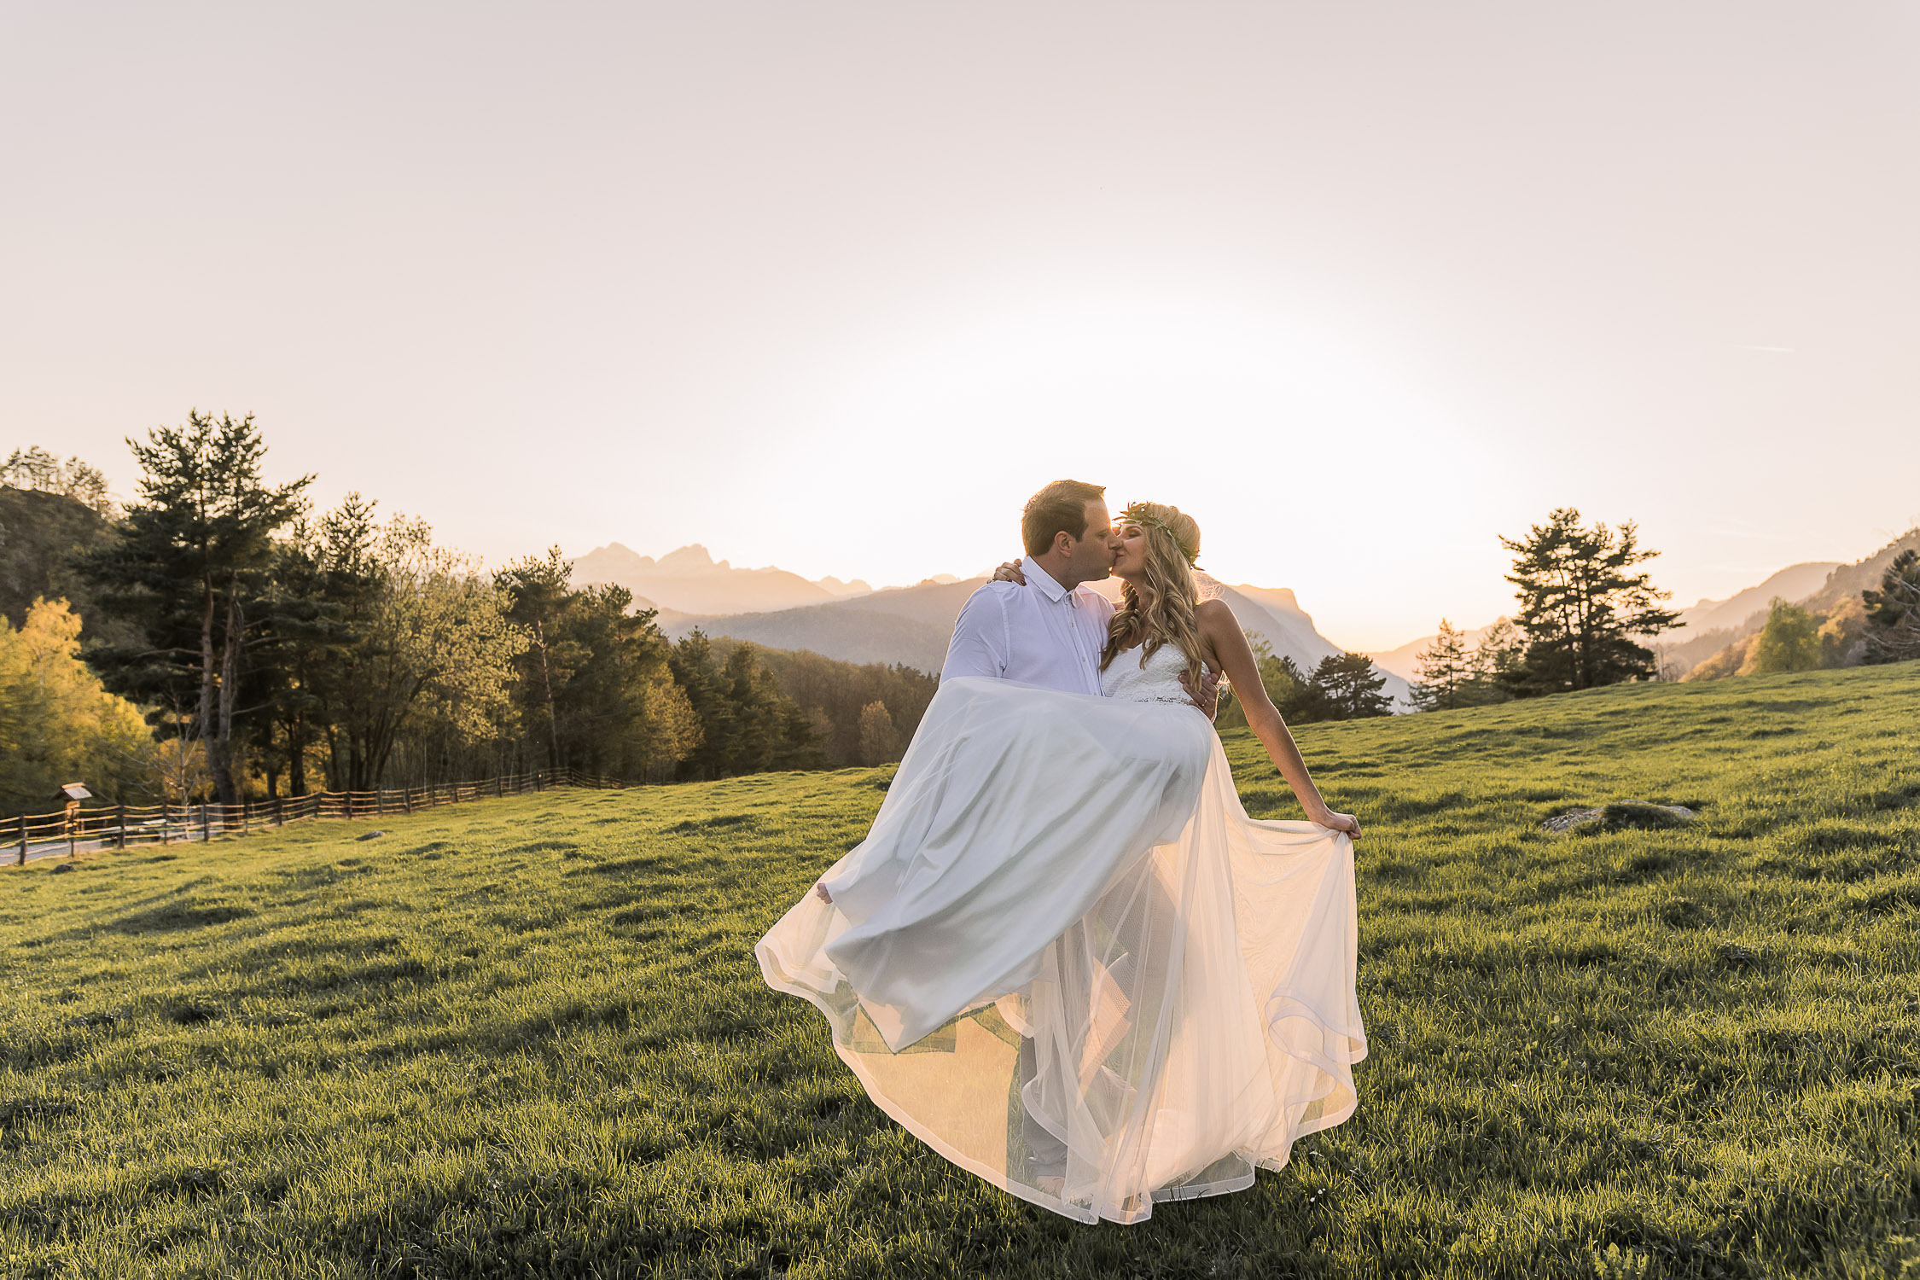 wedding-porocno-fotografiranje-slovenian-wedding-fotograf-poroka-porocni (2 of 289)